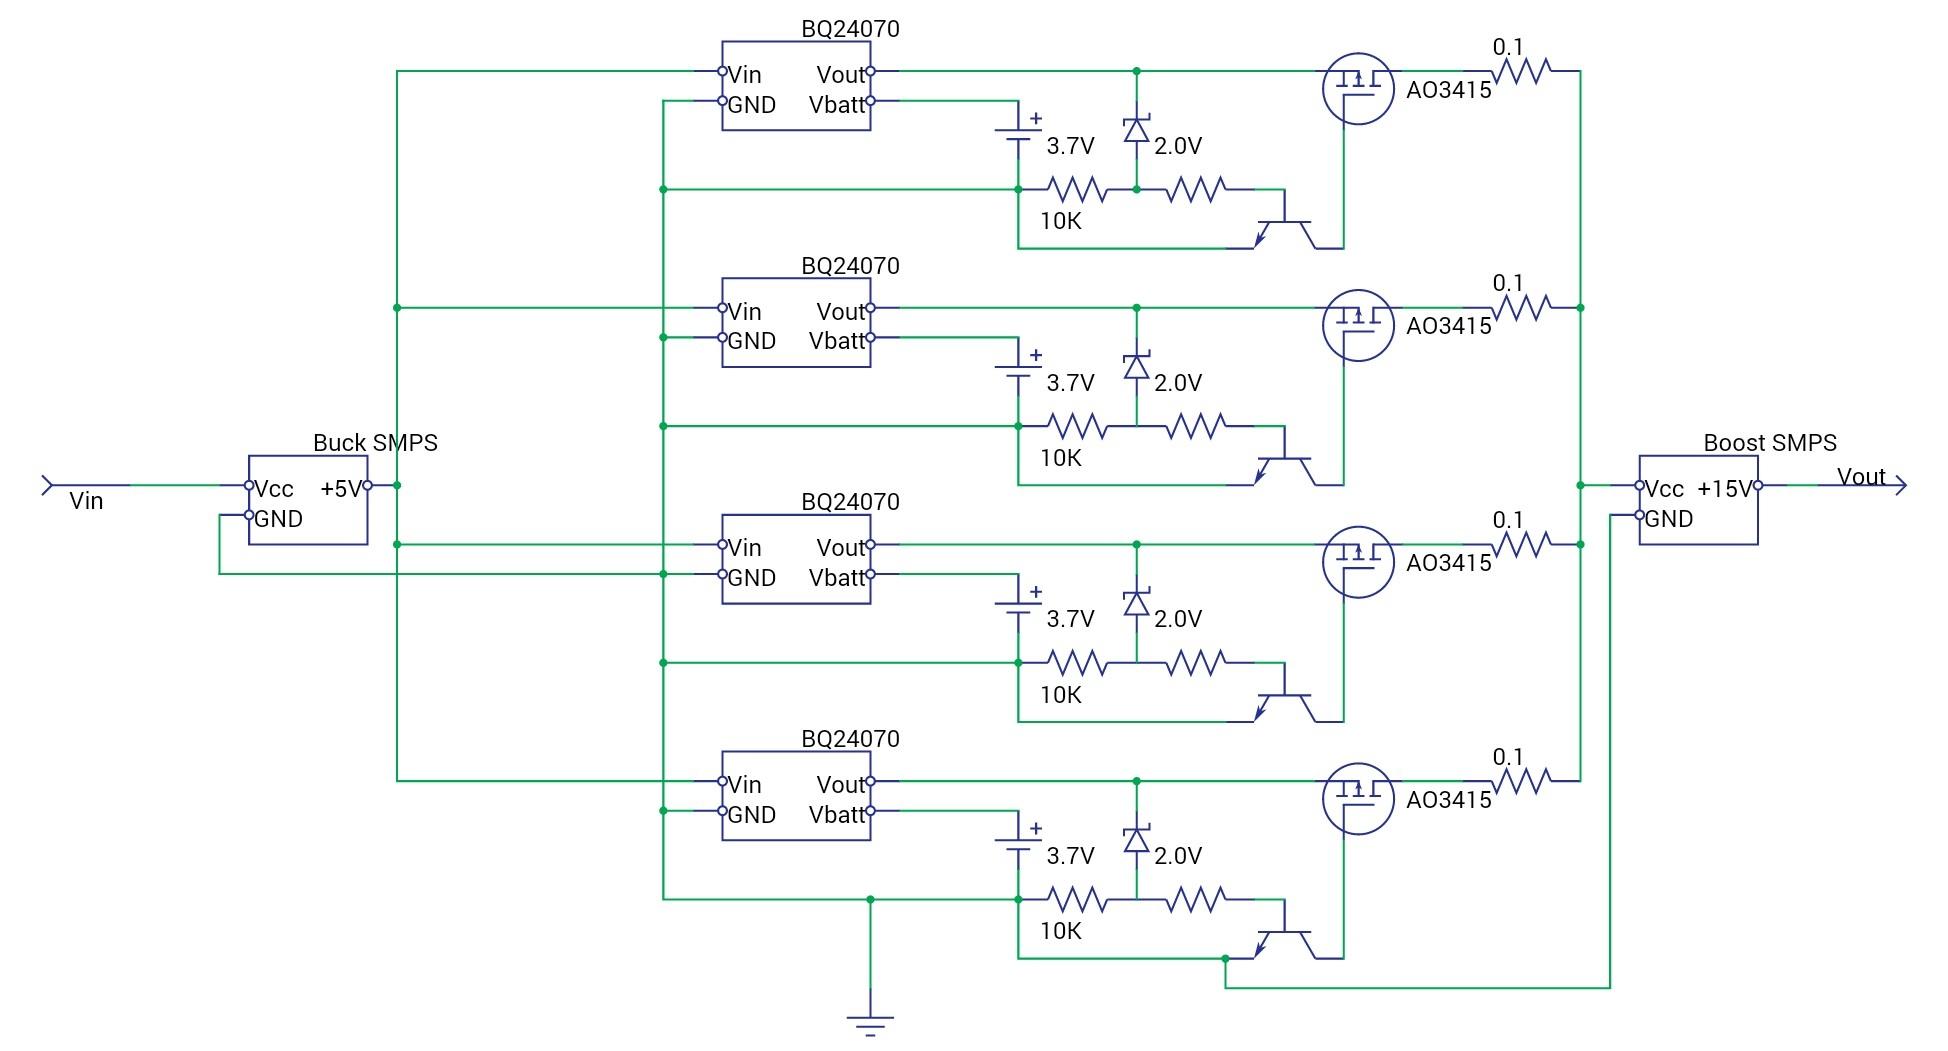 Marine Inverter Charger Wiring Diagram | Free Wiring Diagram on 3000w inverter wiring diagram, inverter charger capacitor, 2000w inverter wiring diagram, pump float diagram, inverter circuit diagram, solar inverter wiring diagram, rv inverter wiring diagram, rv charger wire diagram, inverter charger installation, inverter charger generator, boat inverter wiring diagram, 24 volts inverter diagram, inverter system diagram, power inverter diagram, grid tie inverter wiring diagram, inverter remote control wiring diagram, how aquaponics works diagram, solar power schematic diagram, battery and inverter wiring diagram, sine wave ups circuit diagram,